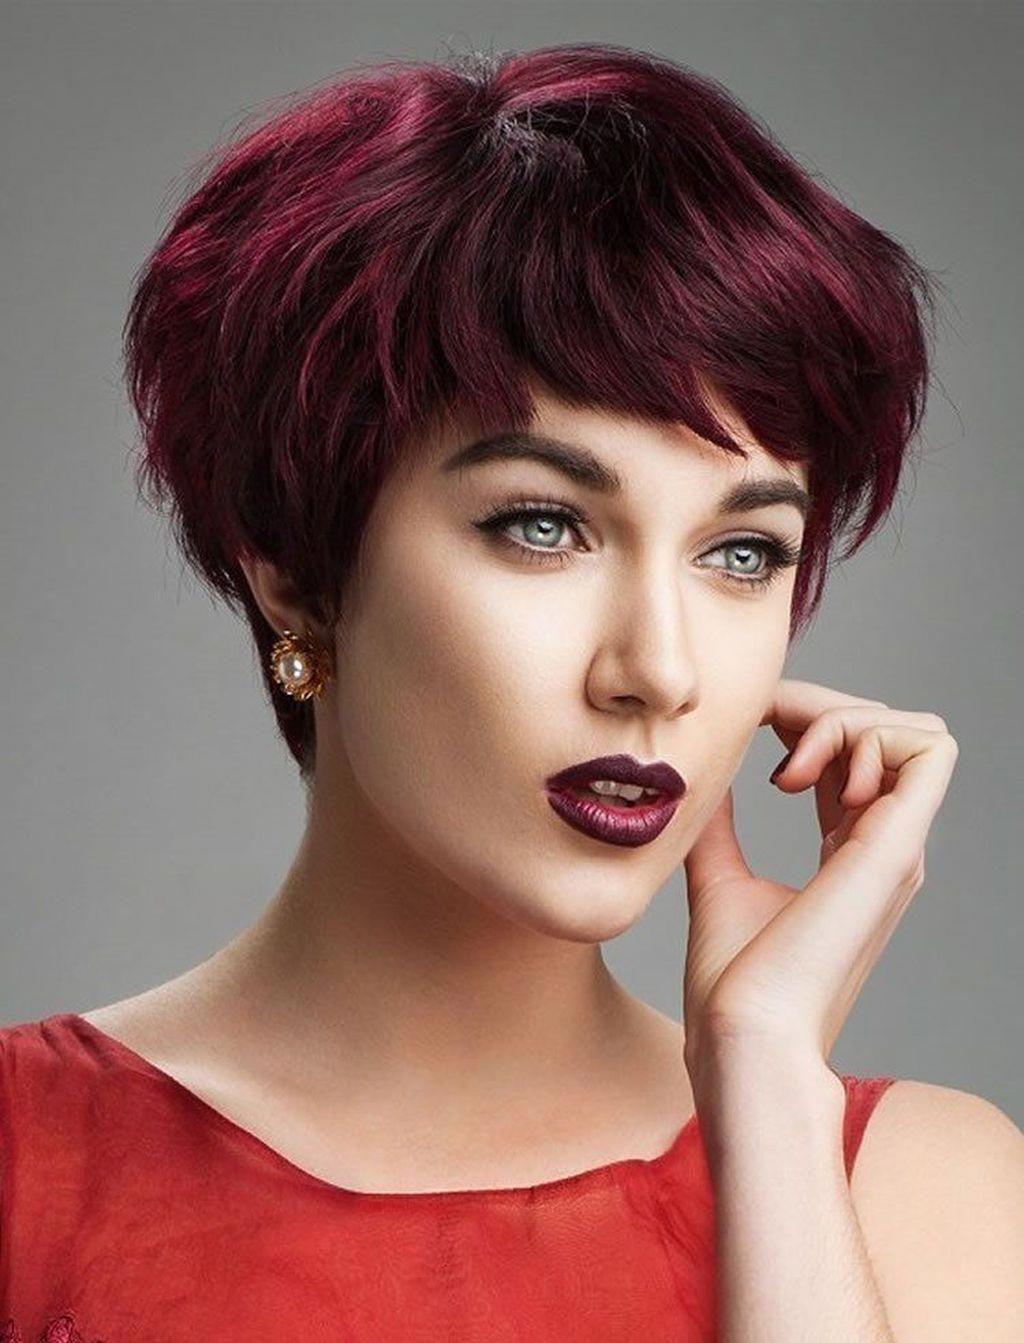 20+ Popular Pixie Haircut Ideas For Spring 2019   Short ...